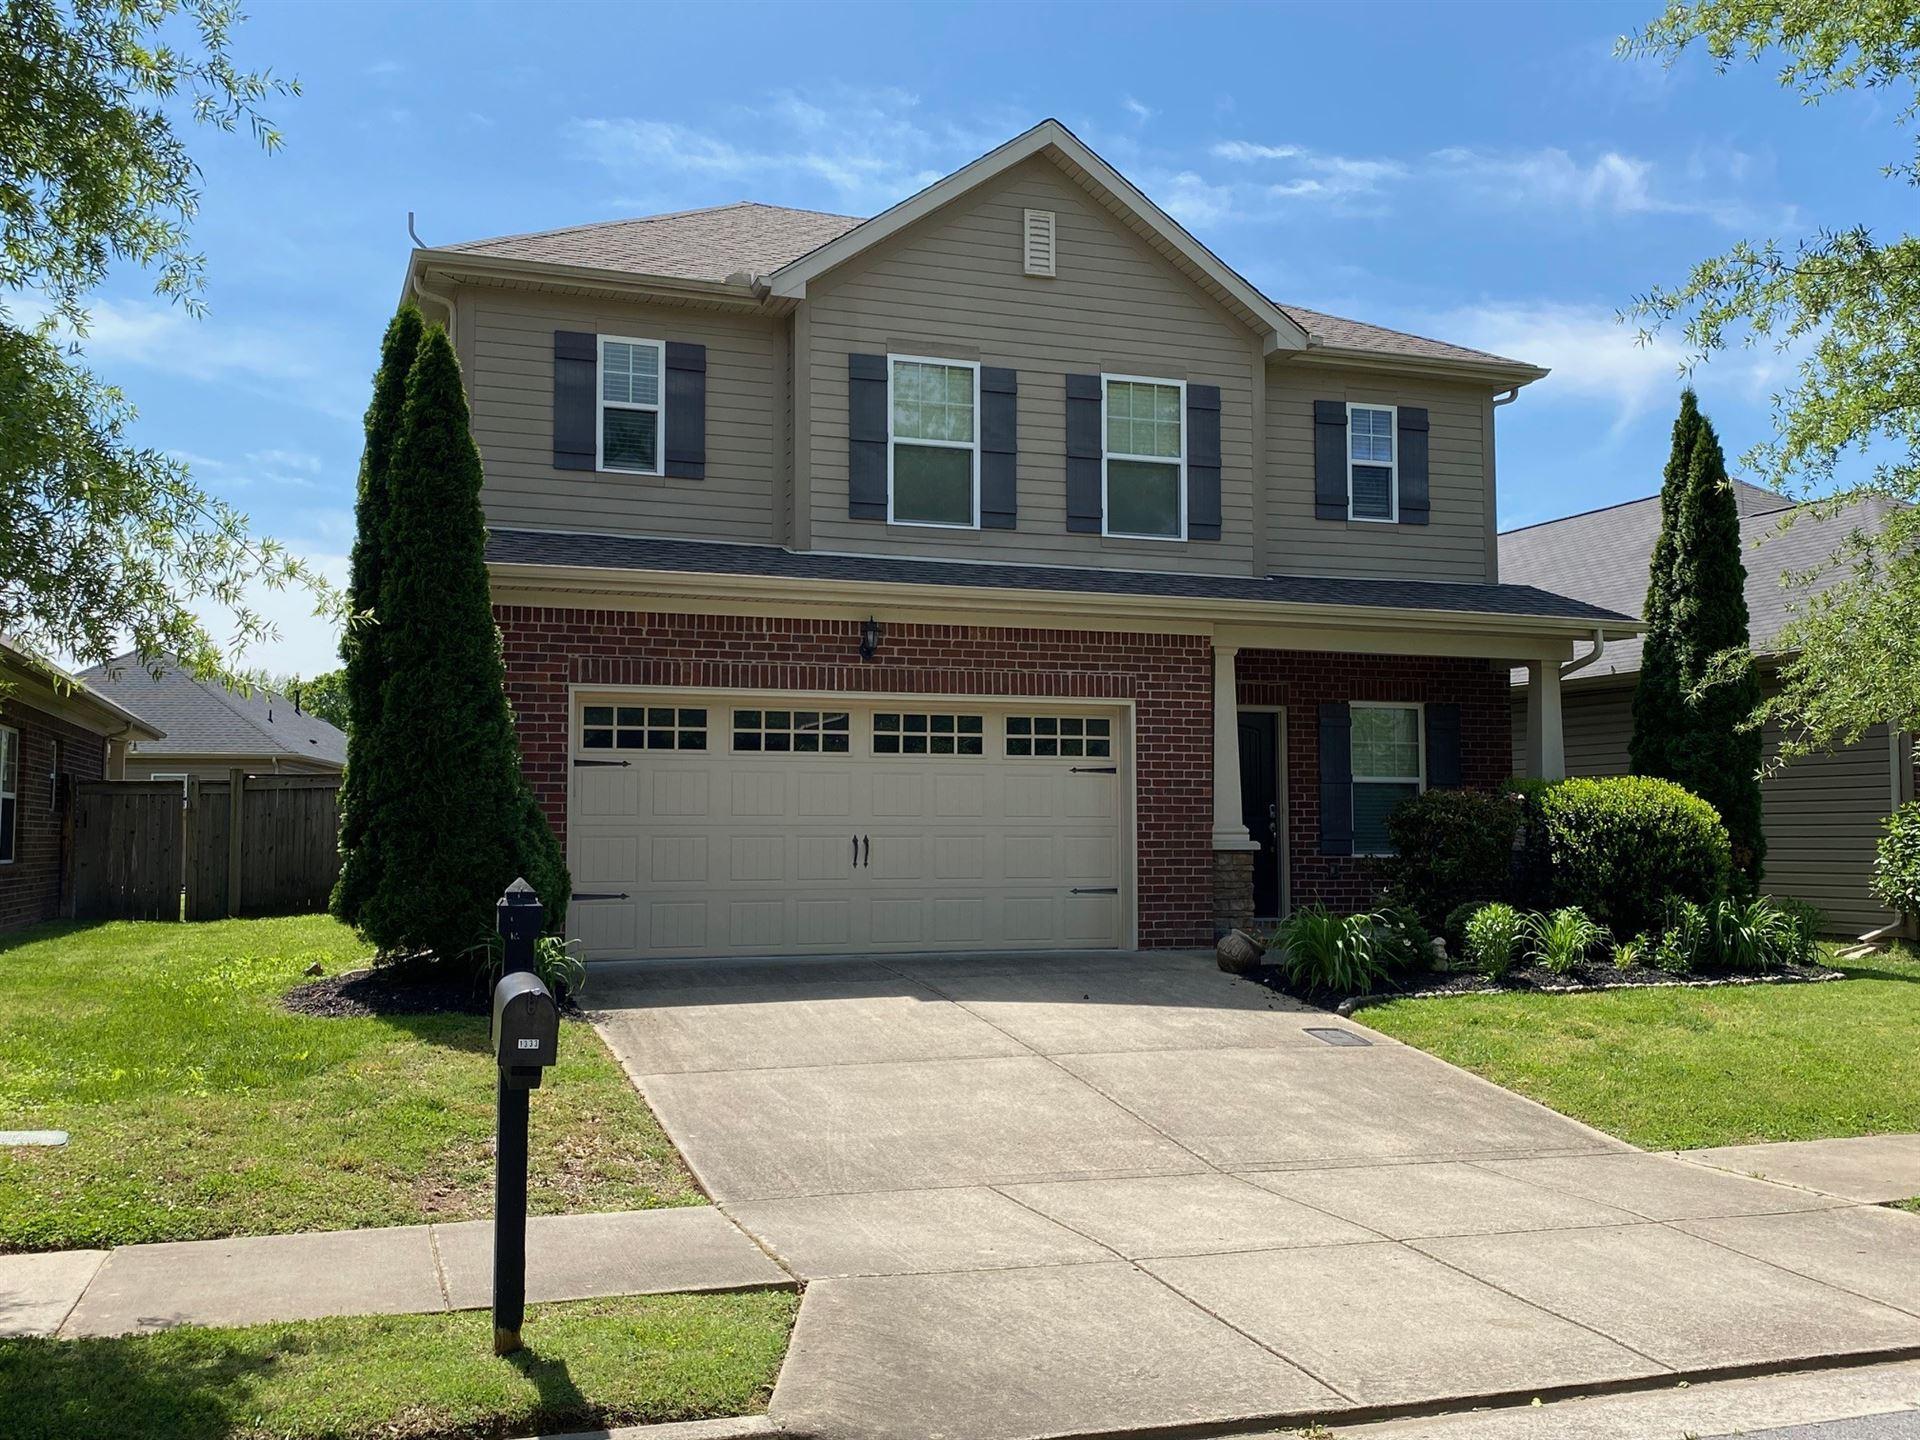 1333 Westvale Dr, Nashville, TN 37221 - MLS#: 2253246